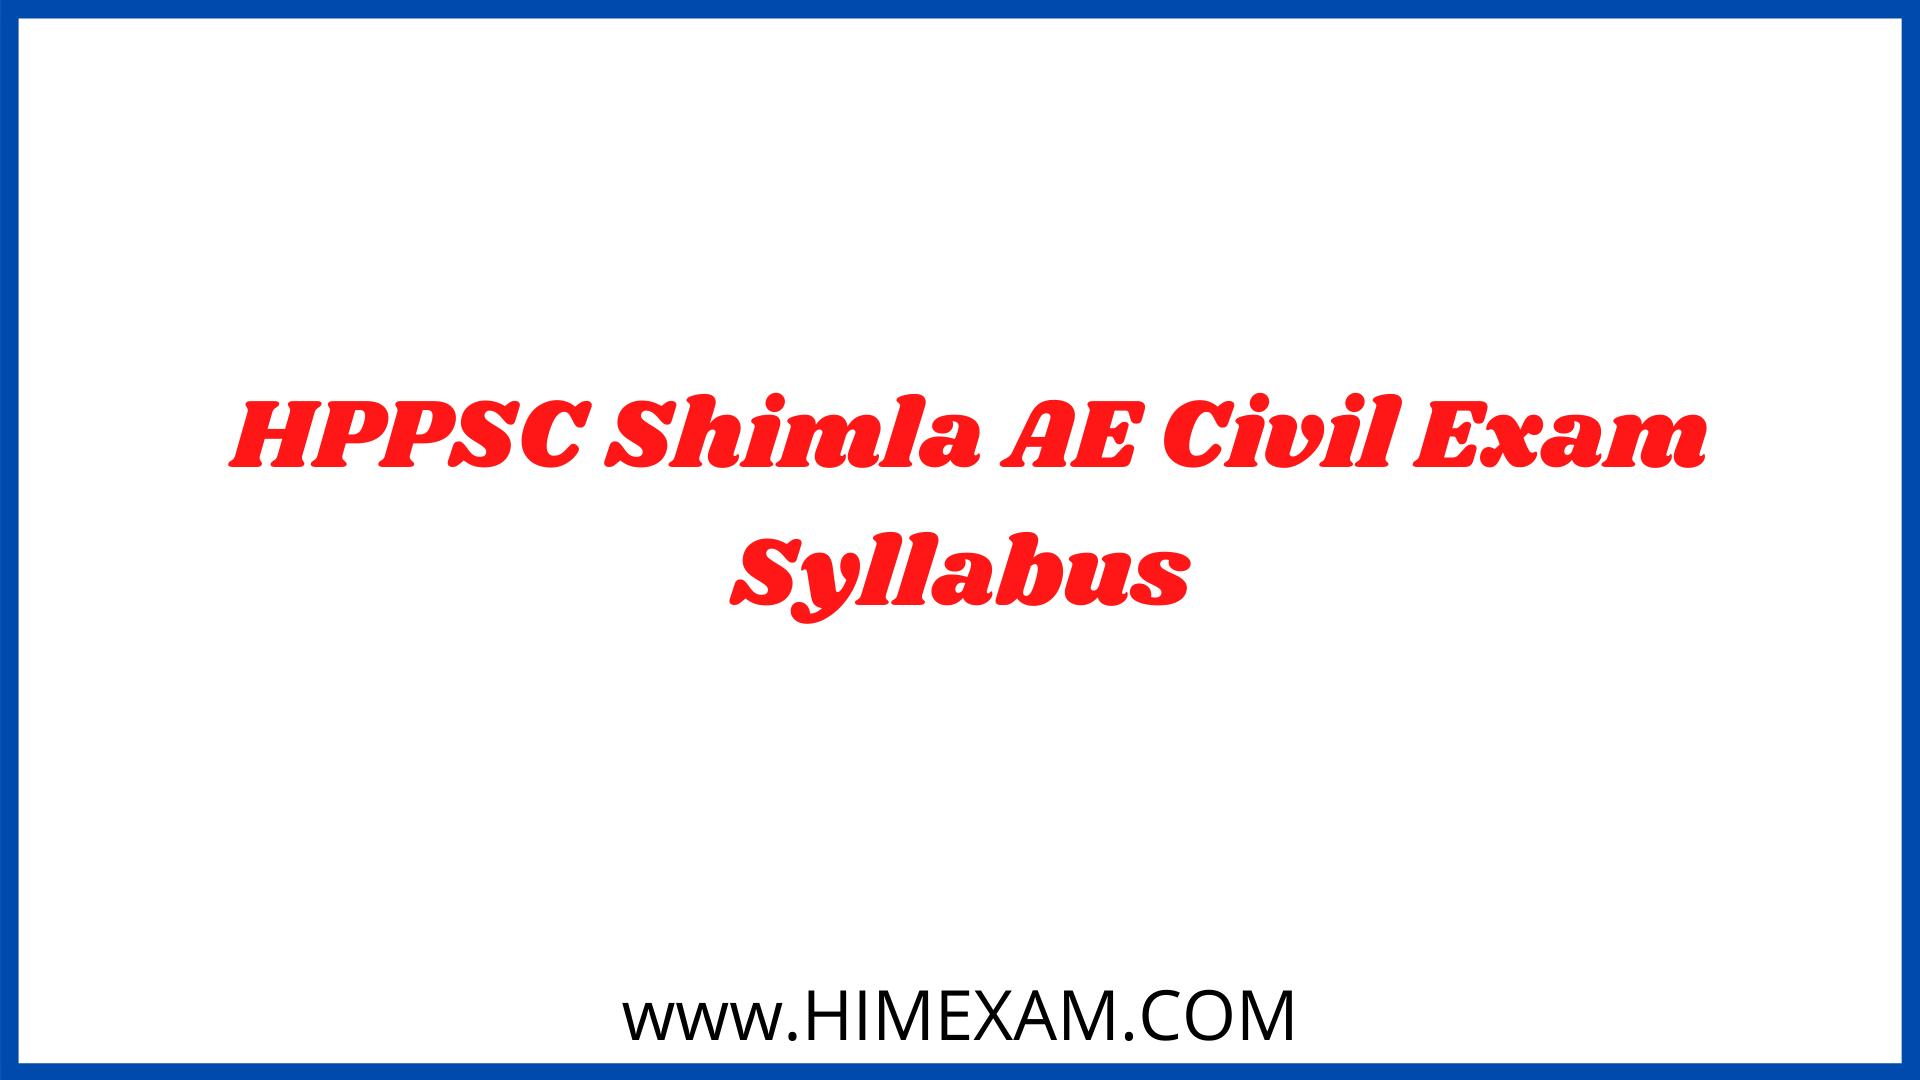 HPPSC Shimla AE Civil Exam Syllabus